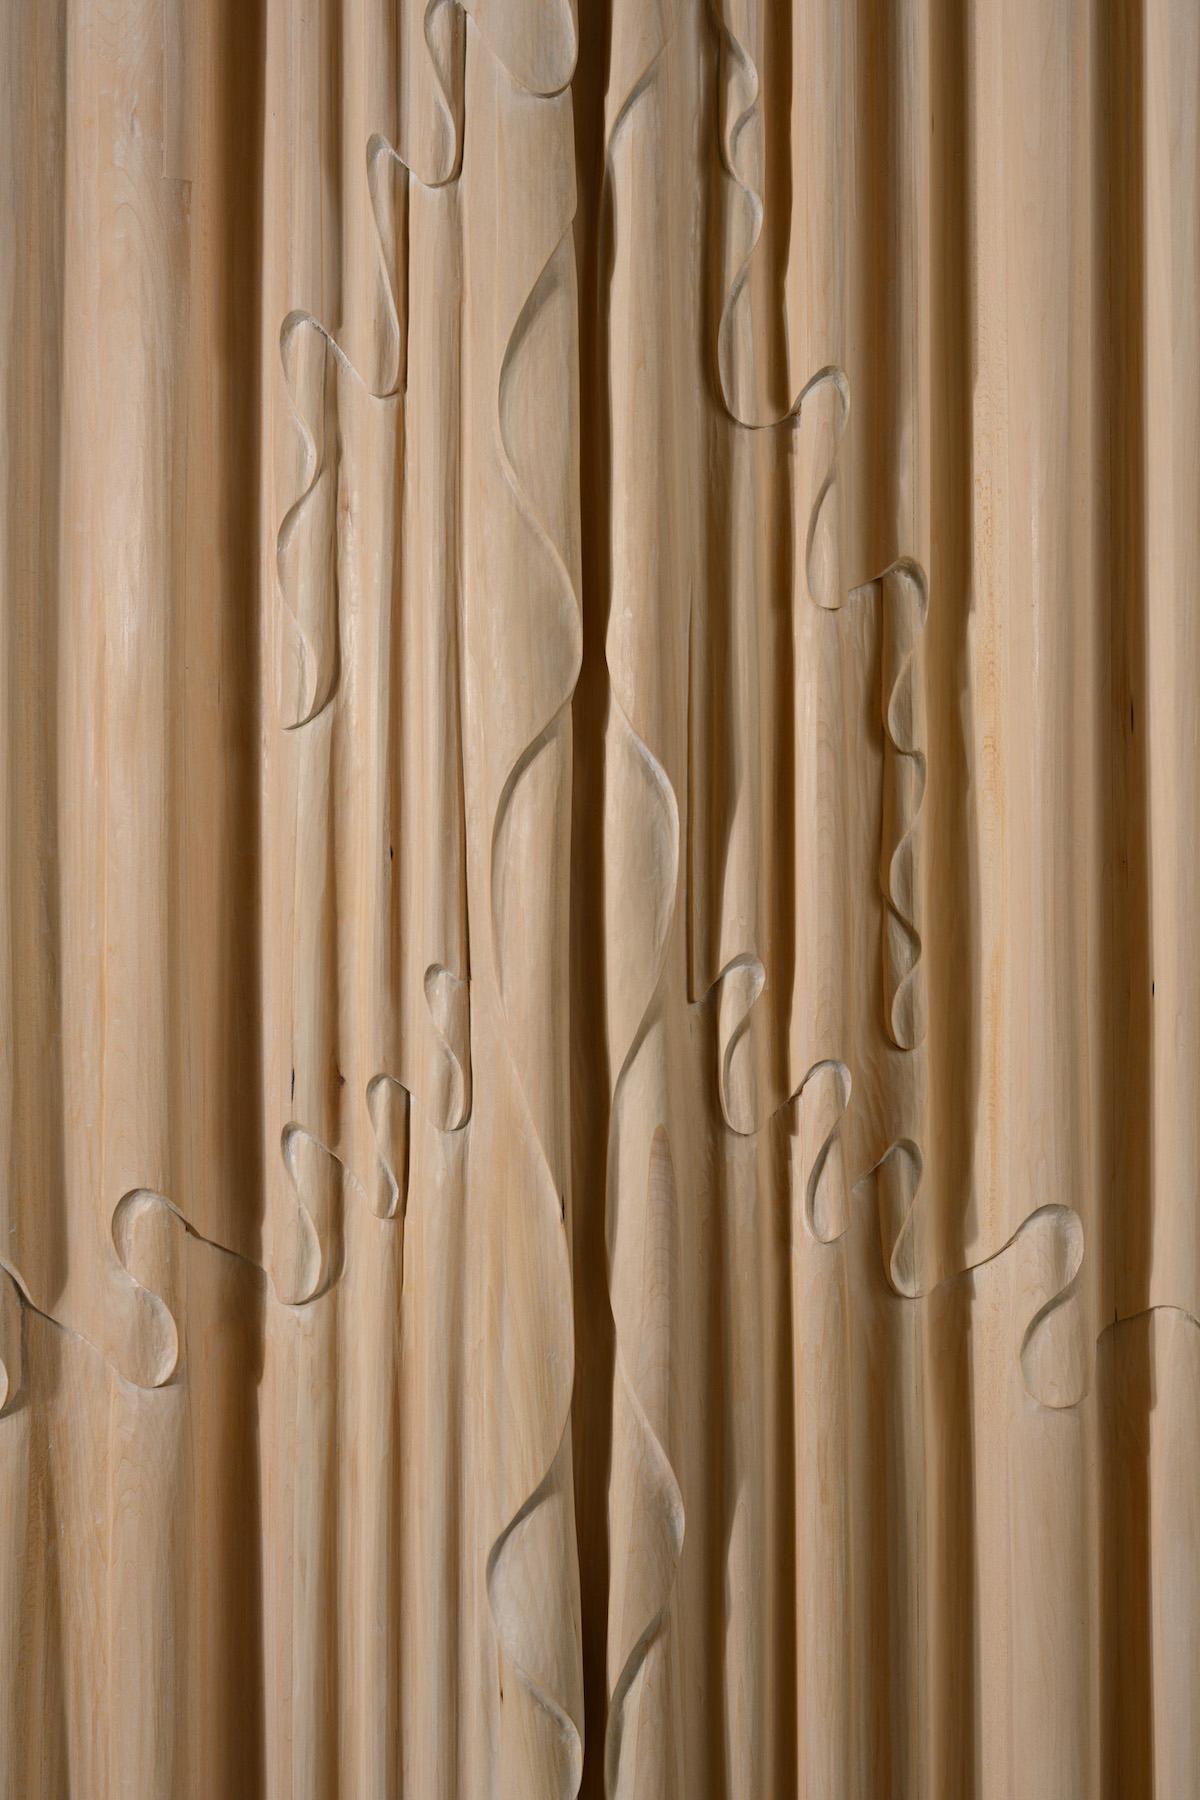 Surface detail of Linenfold Armoire by artist Christopher Kurtz